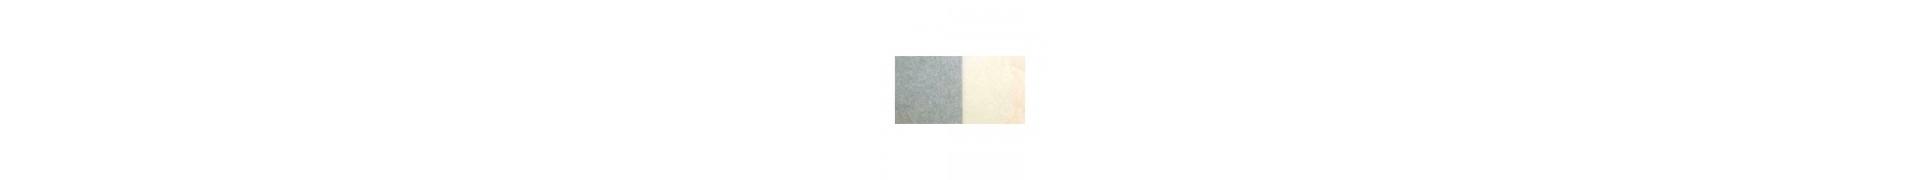 Papier du monde AMI Minota - 35g - F:54 x 65 cm - 100113